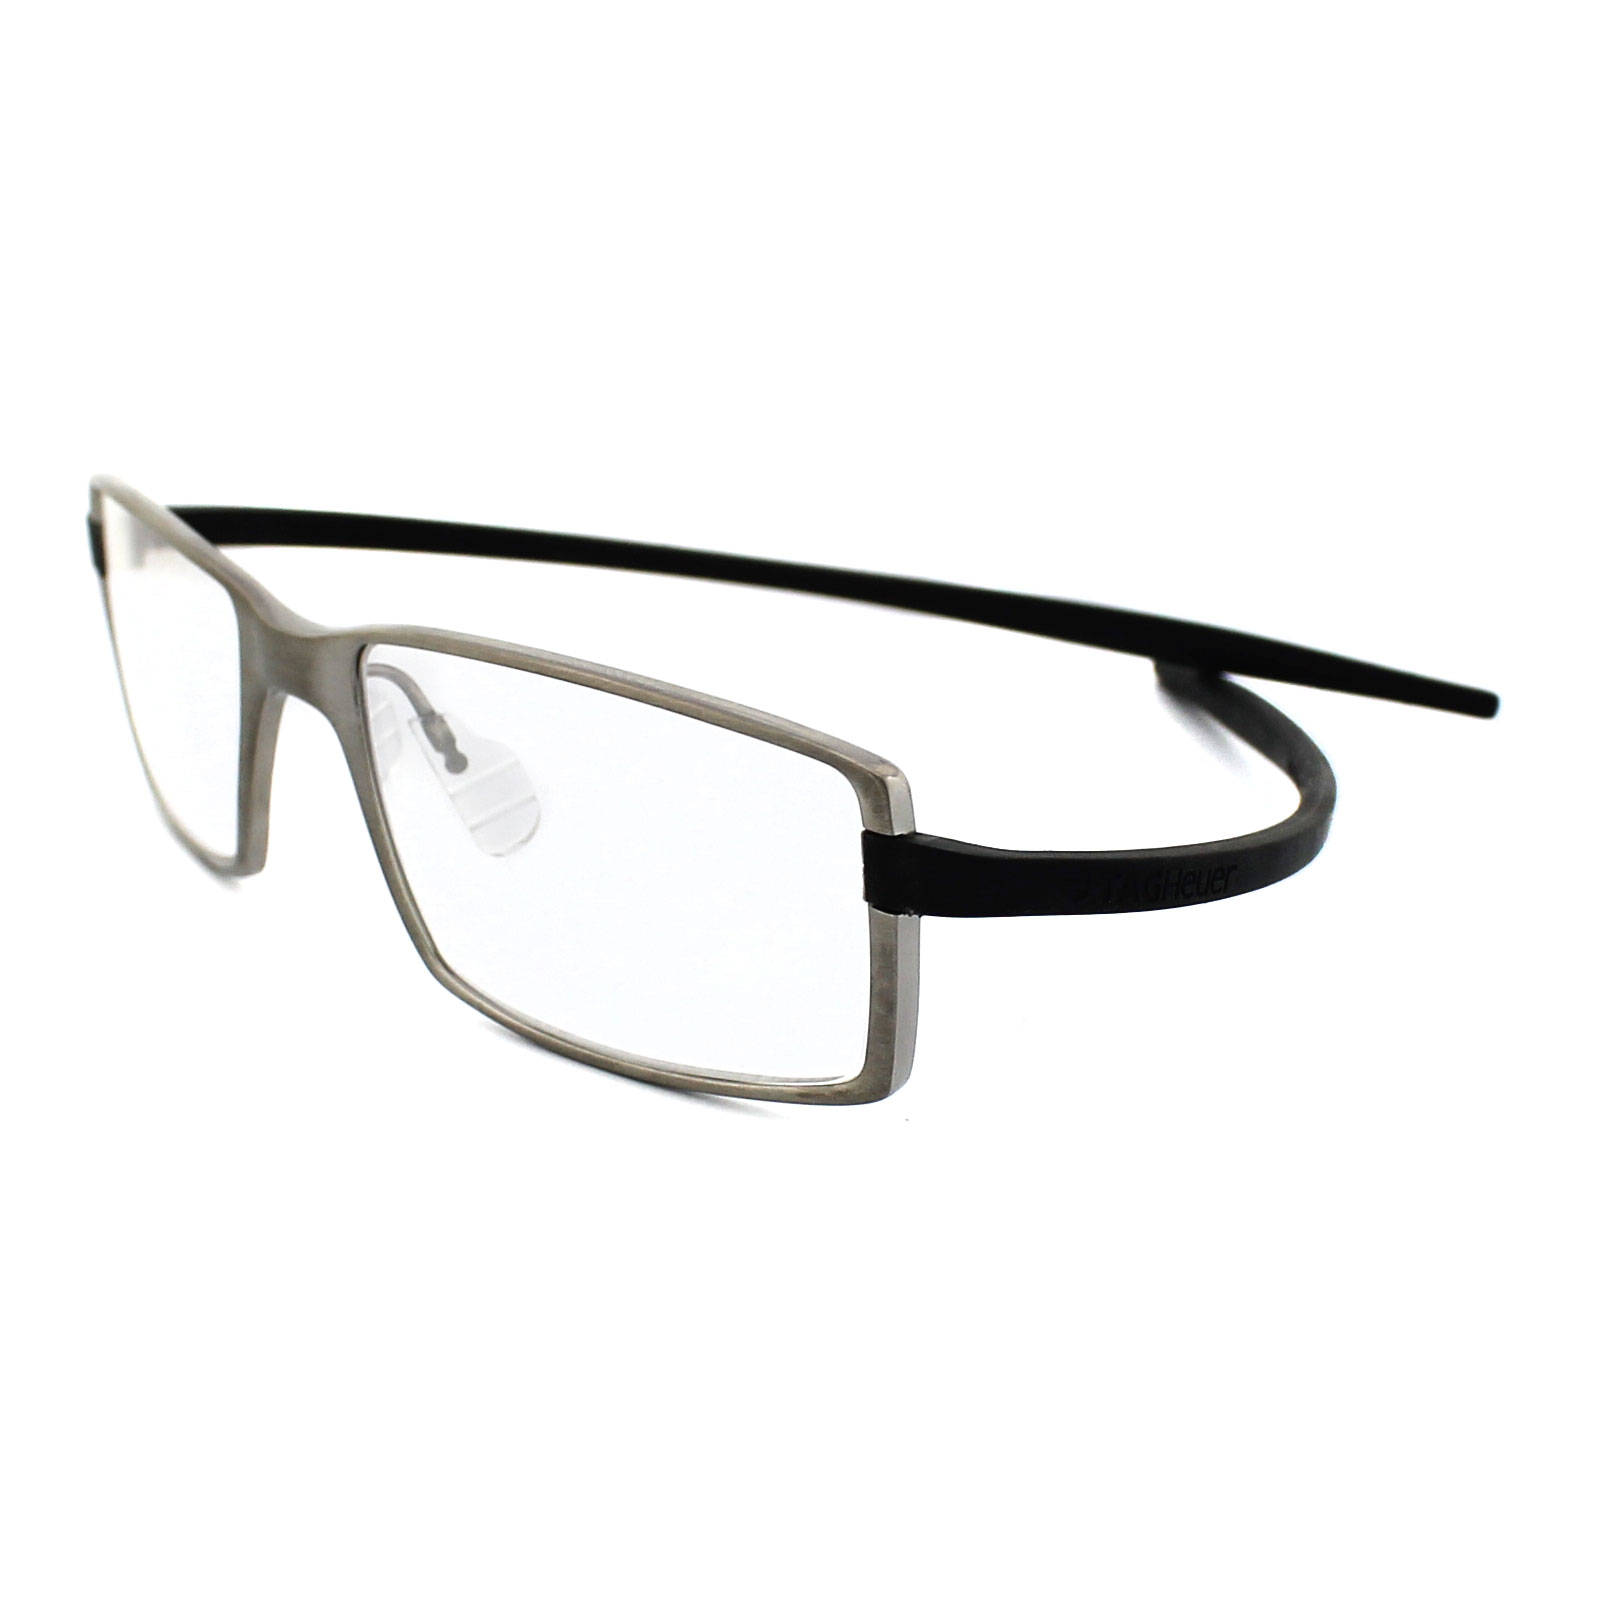 Tag heuer eyeglasses frames uk - Tag Heuer Reflex 2 3702 Frames